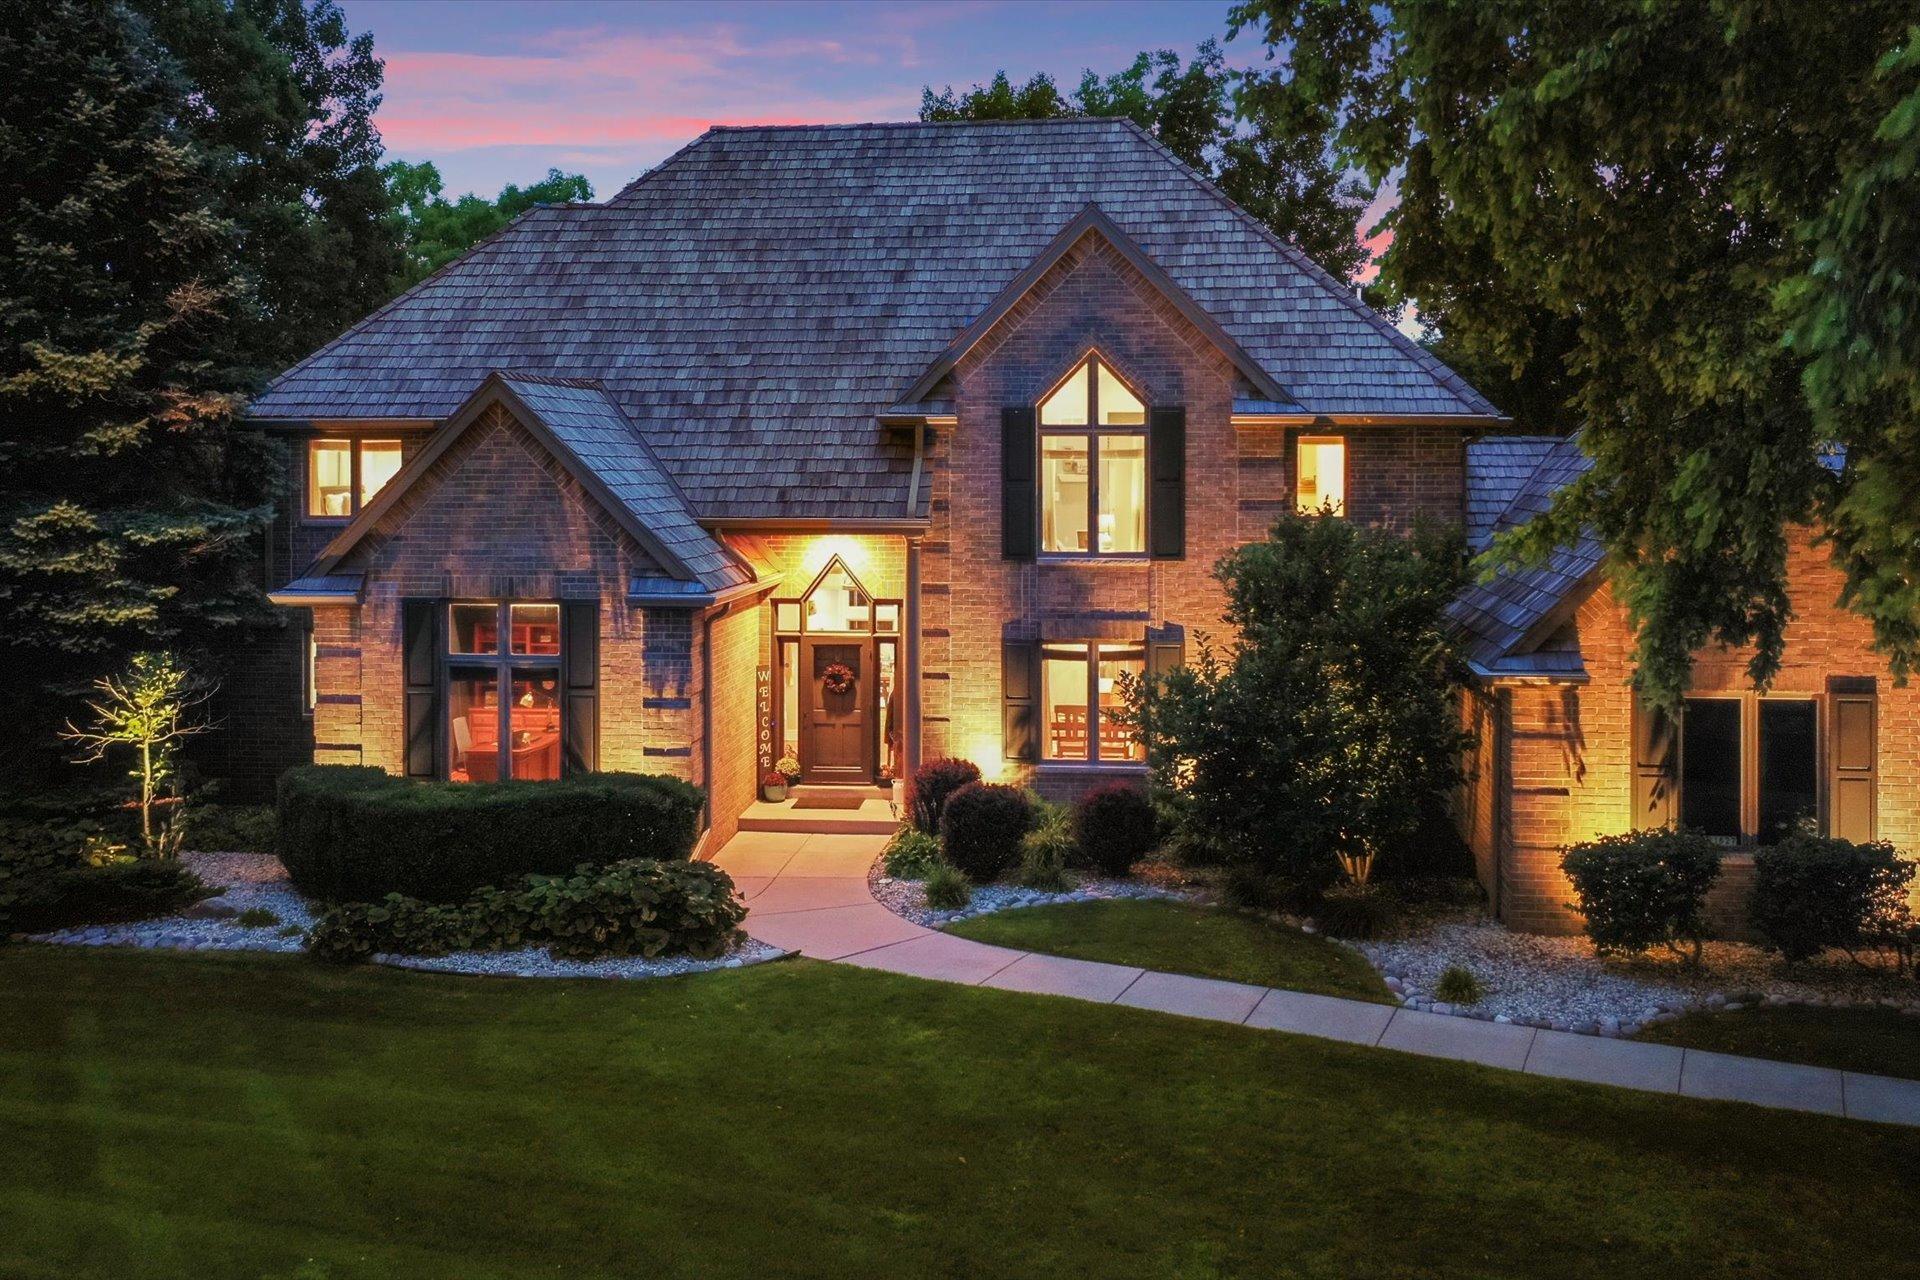 W307N1627 Shadowood Pt, Delafield, Wisconsin 53018, 4 Bedrooms Bedrooms, 13 Rooms Rooms,4 BathroomsBathrooms,Single-Family,For Sale,Shadowood Pt,1754406